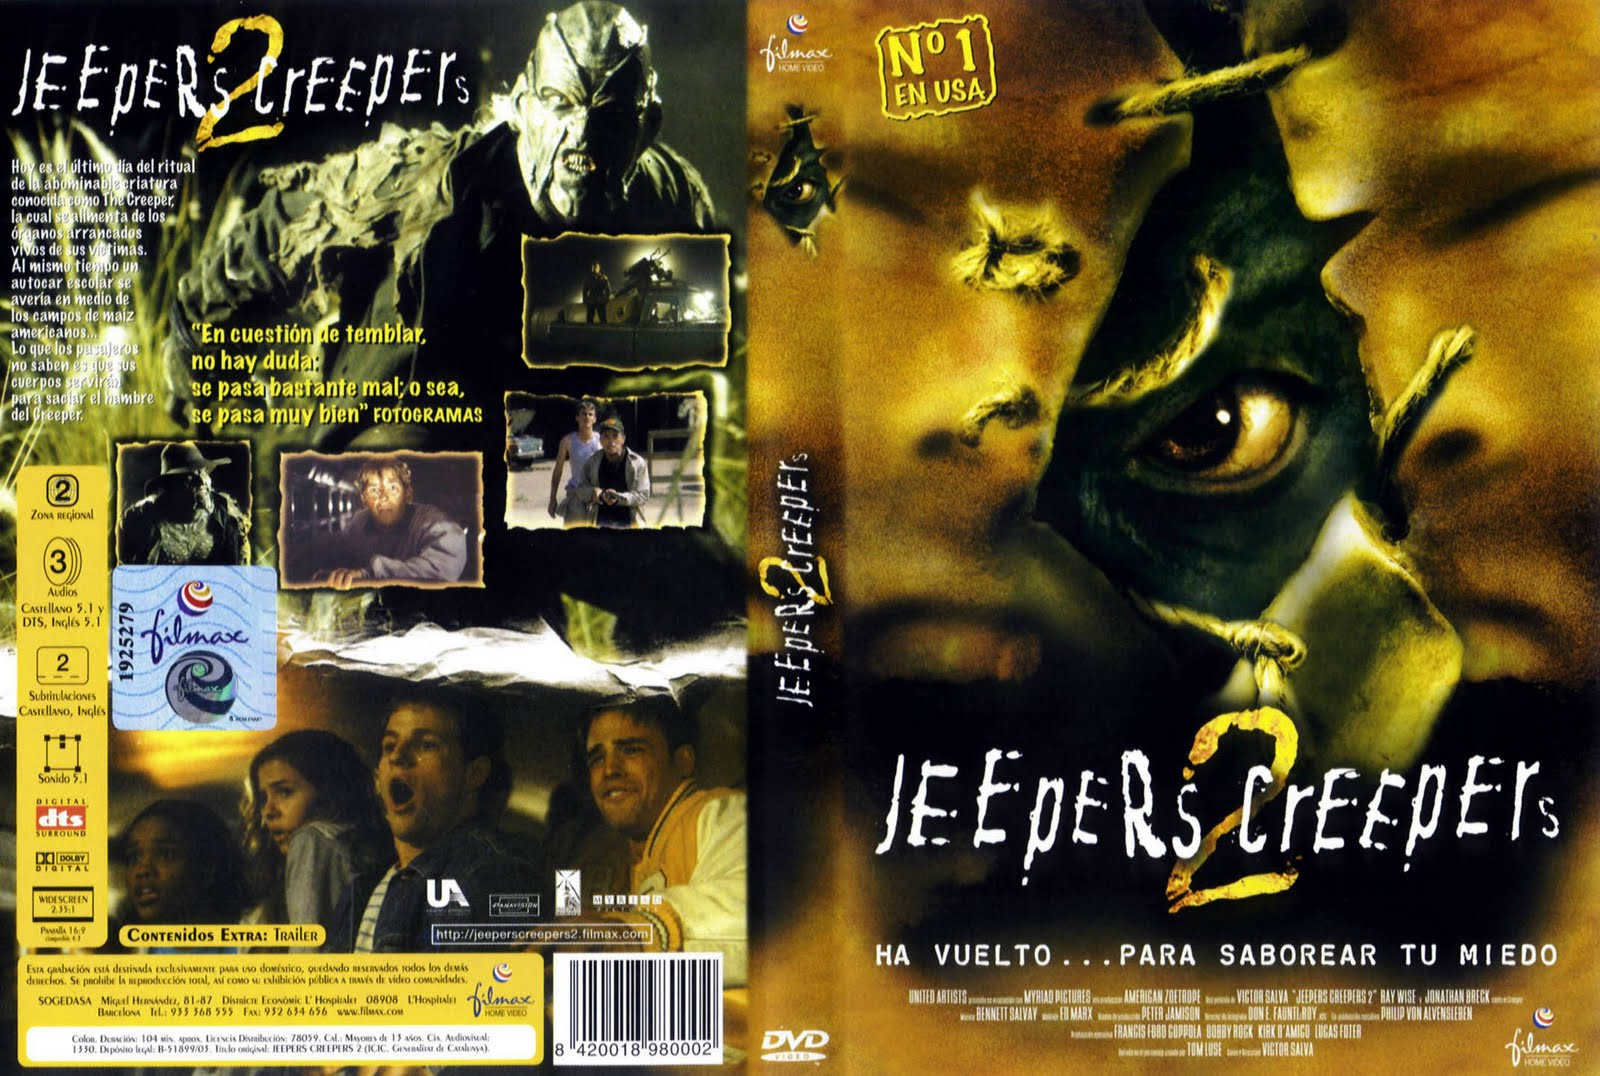 jeepers creepers 2 pelicula completa en español